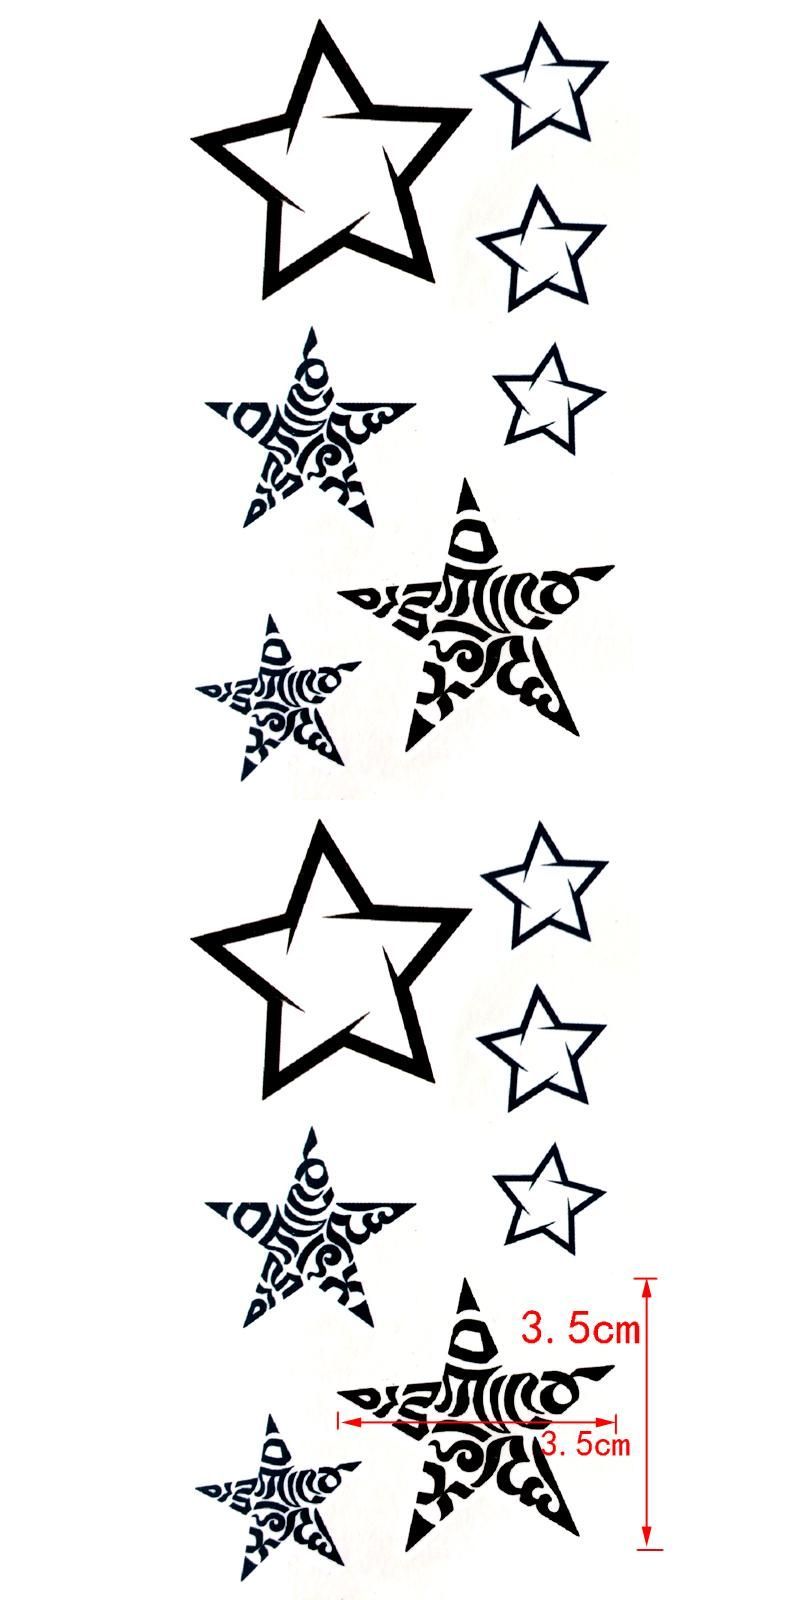 [Visit to Buy] Flash Star Waterproof Temporary Tattoo sticker for men and woman henna tatouage glitter tattoo tatuagem temporaria #Advertisement